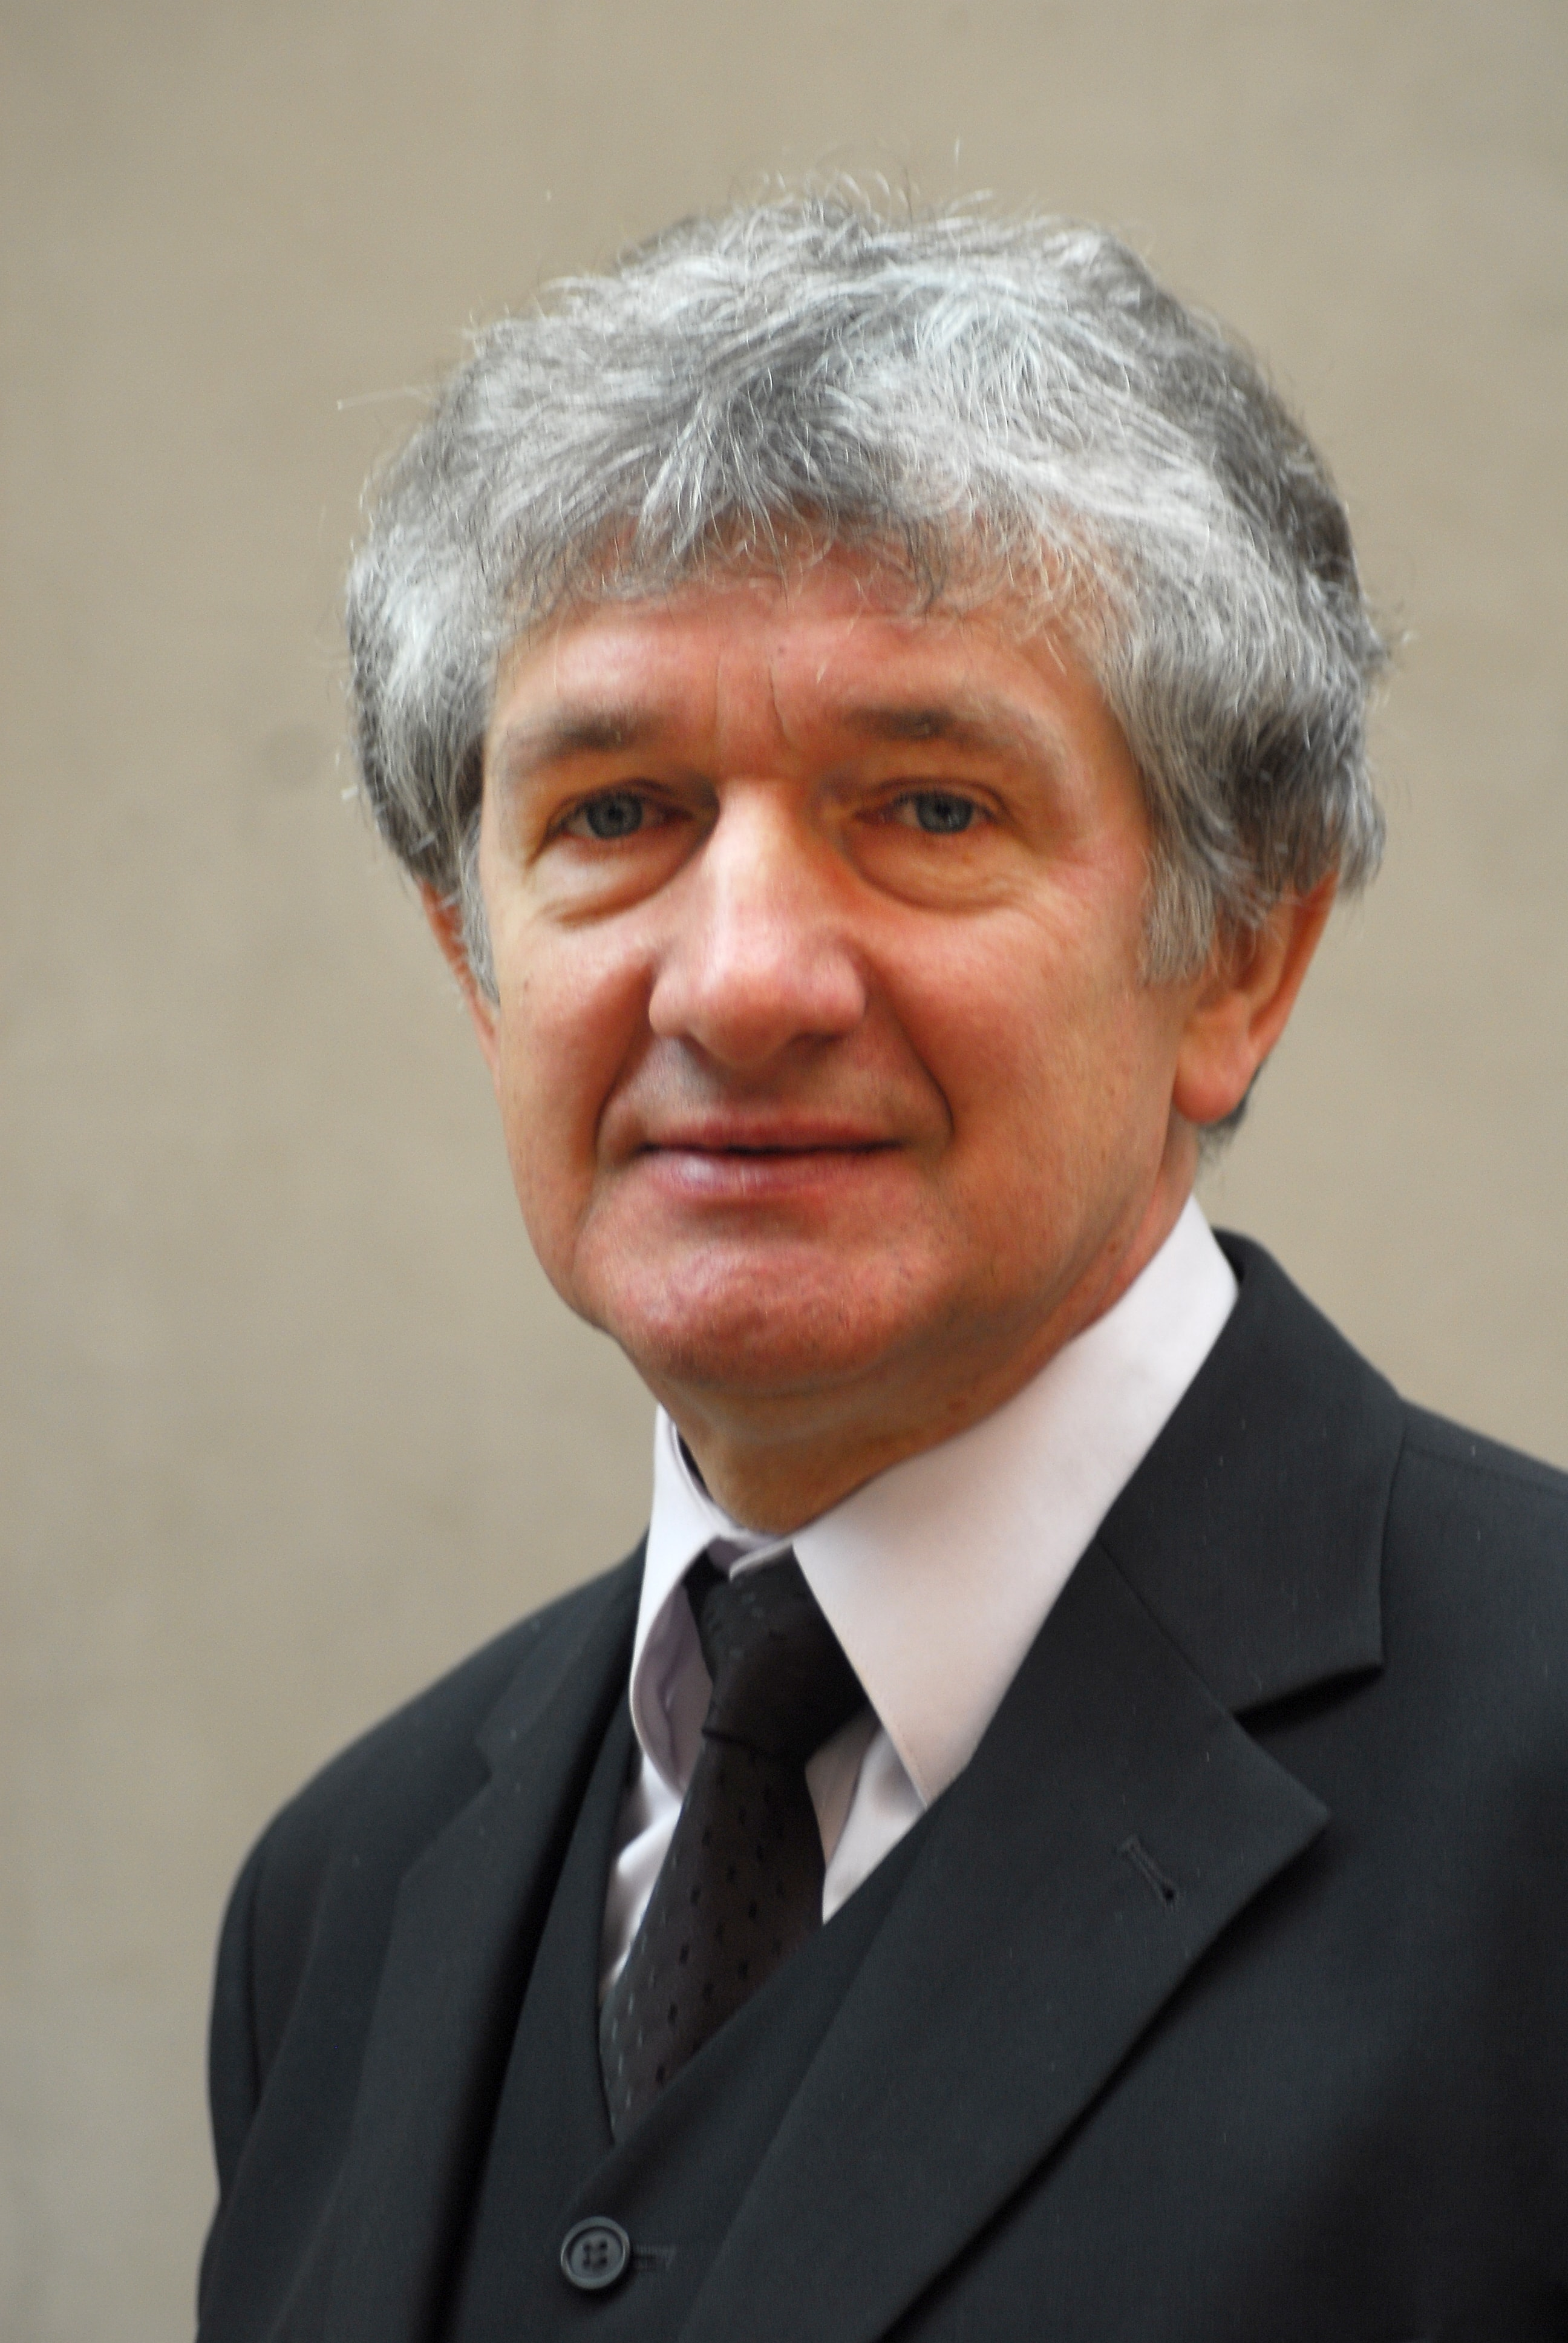 Julian datovania 2014